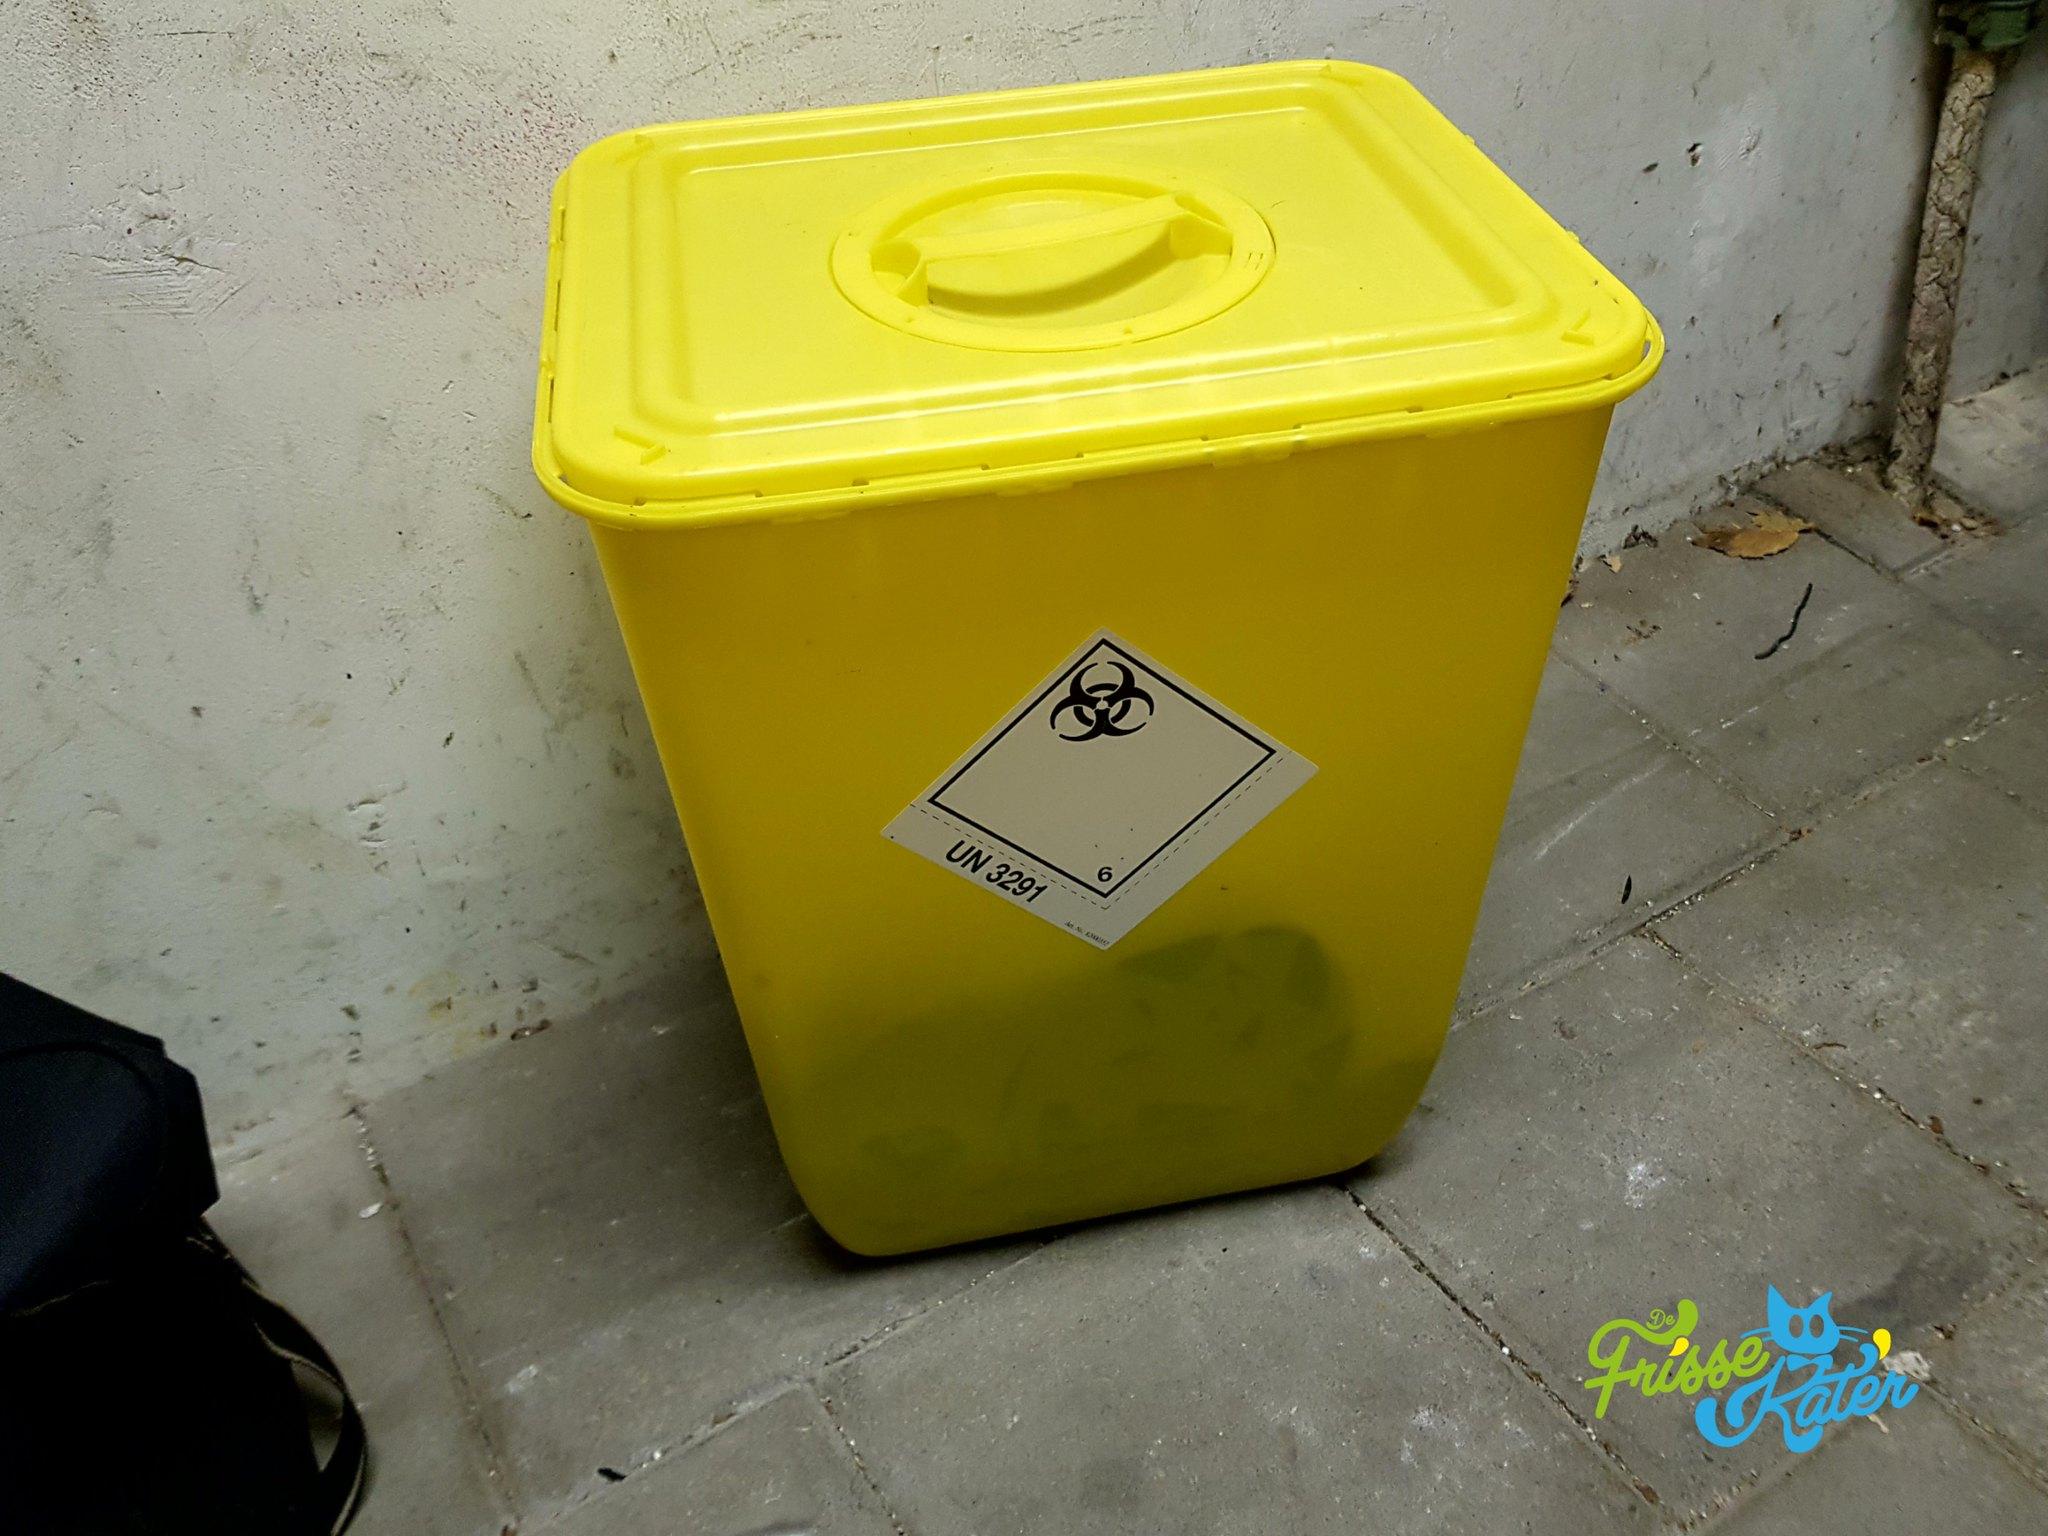 biohazard symbool